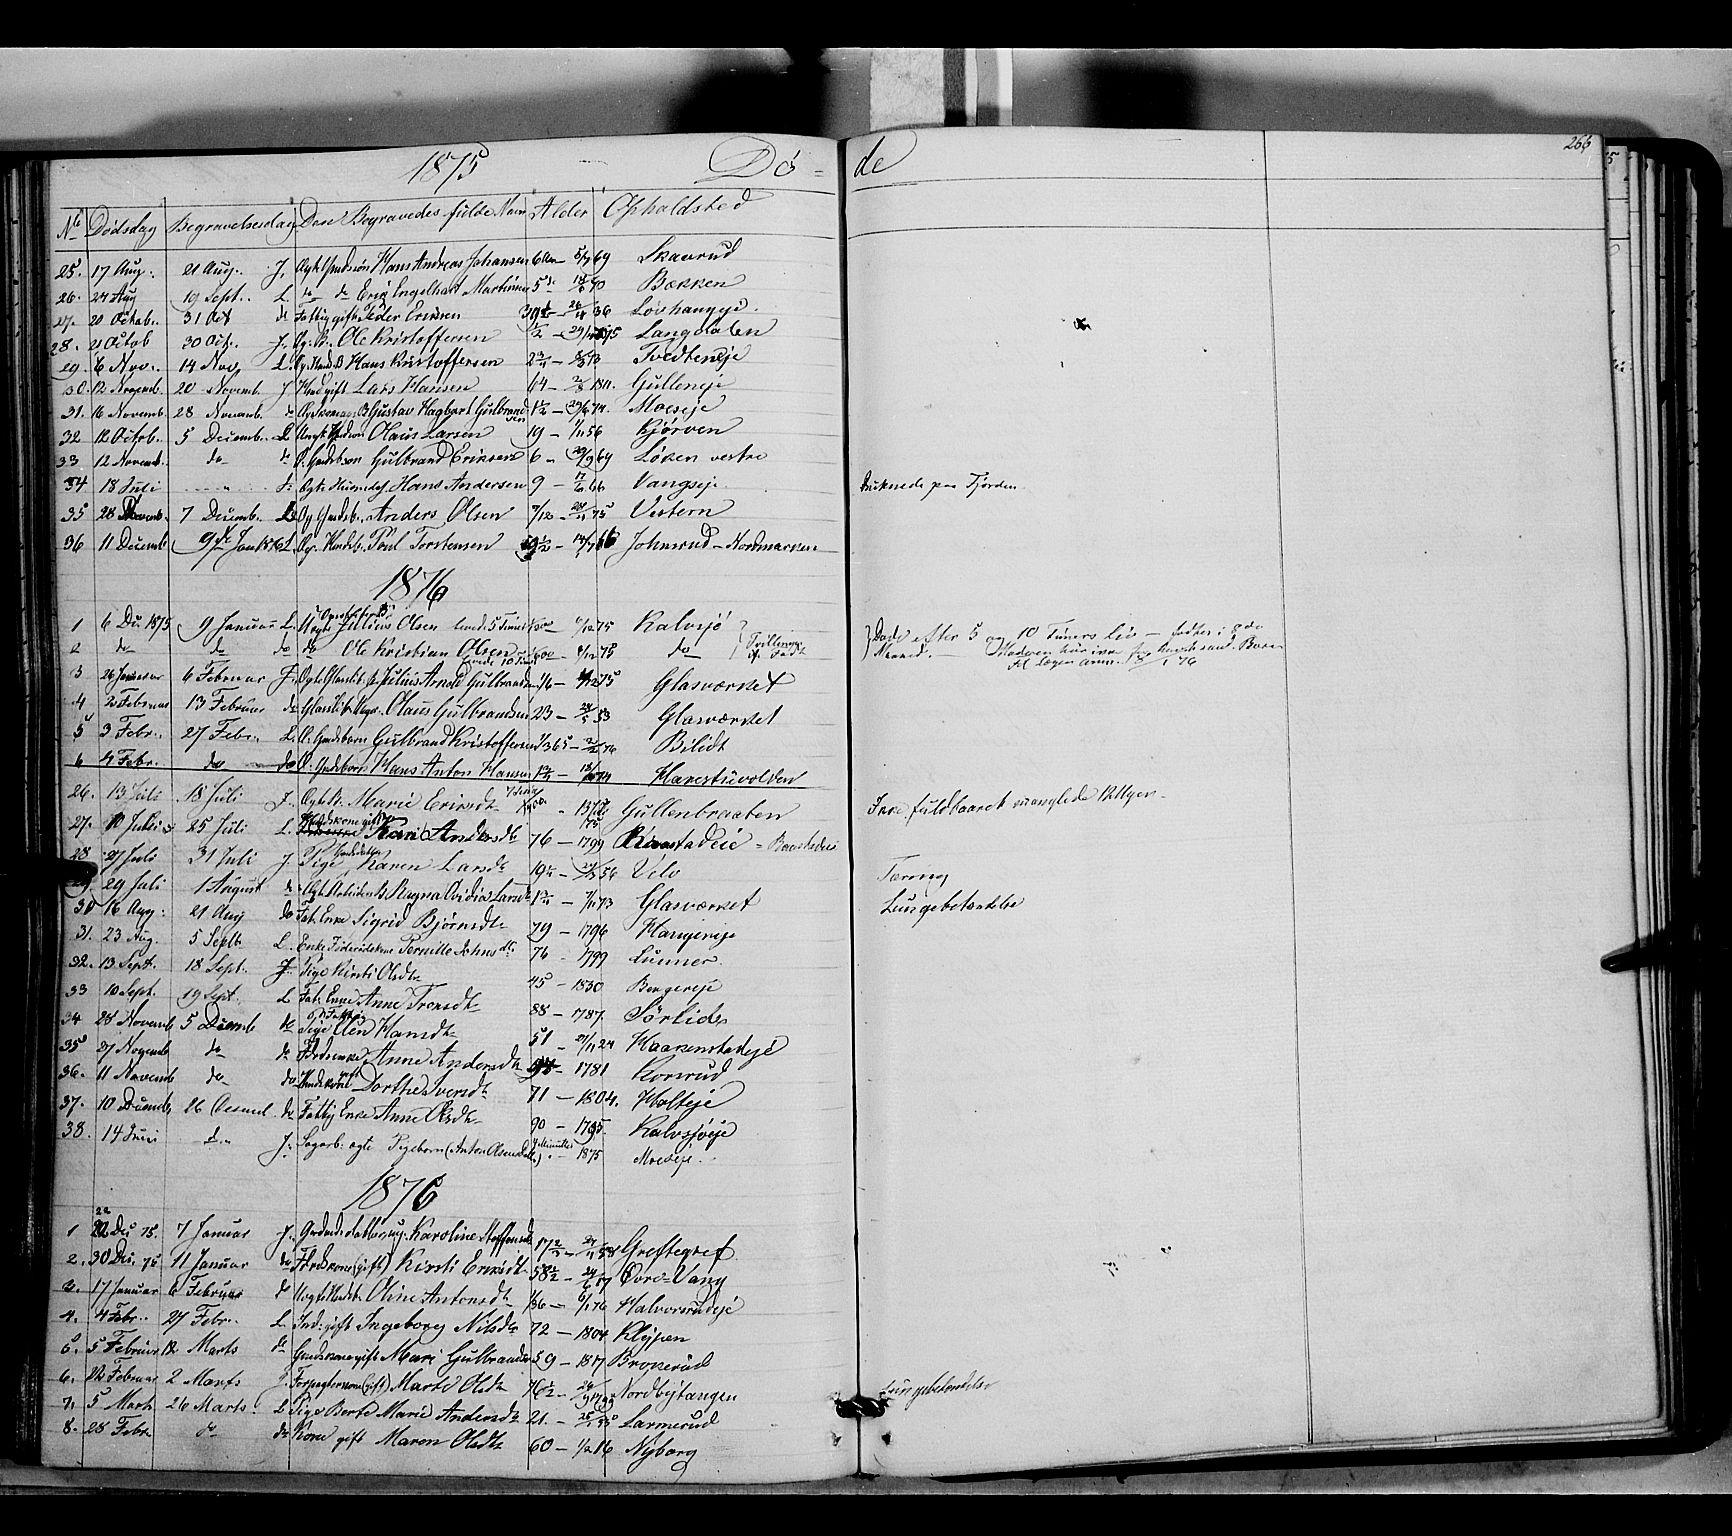 SAH, Jevnaker prestekontor, Ministerialbok nr. 7, 1858-1876, s. 266